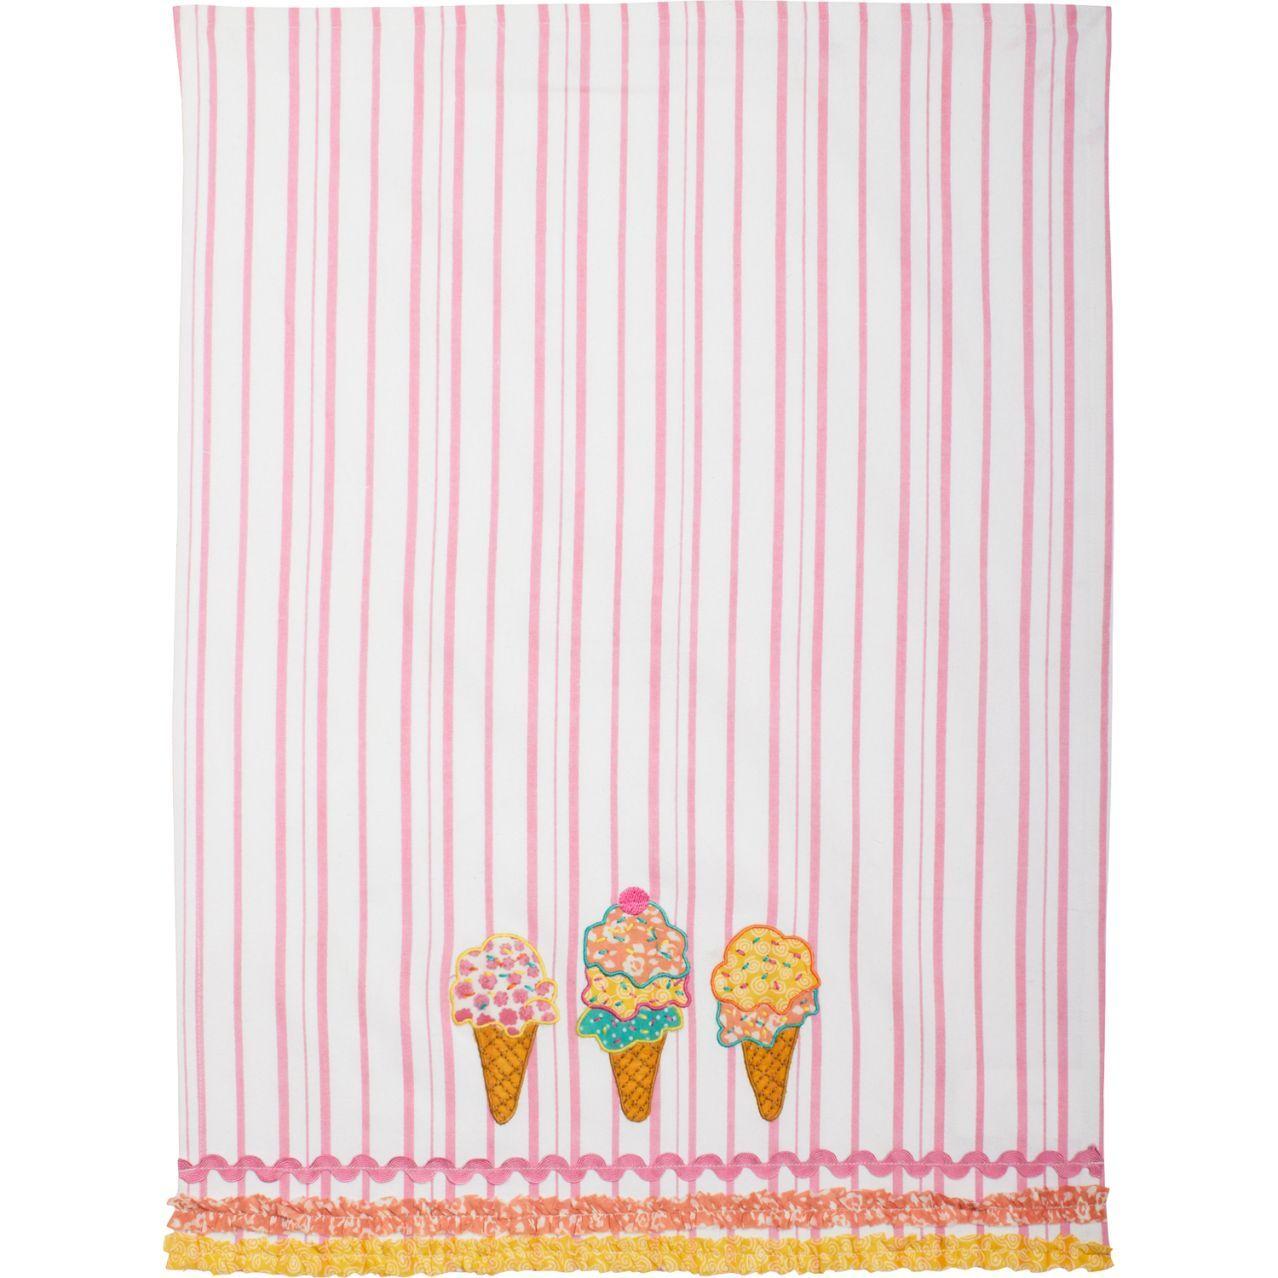 Ice Cream Vintage Inspired Kitchen Towel | Sur La Table